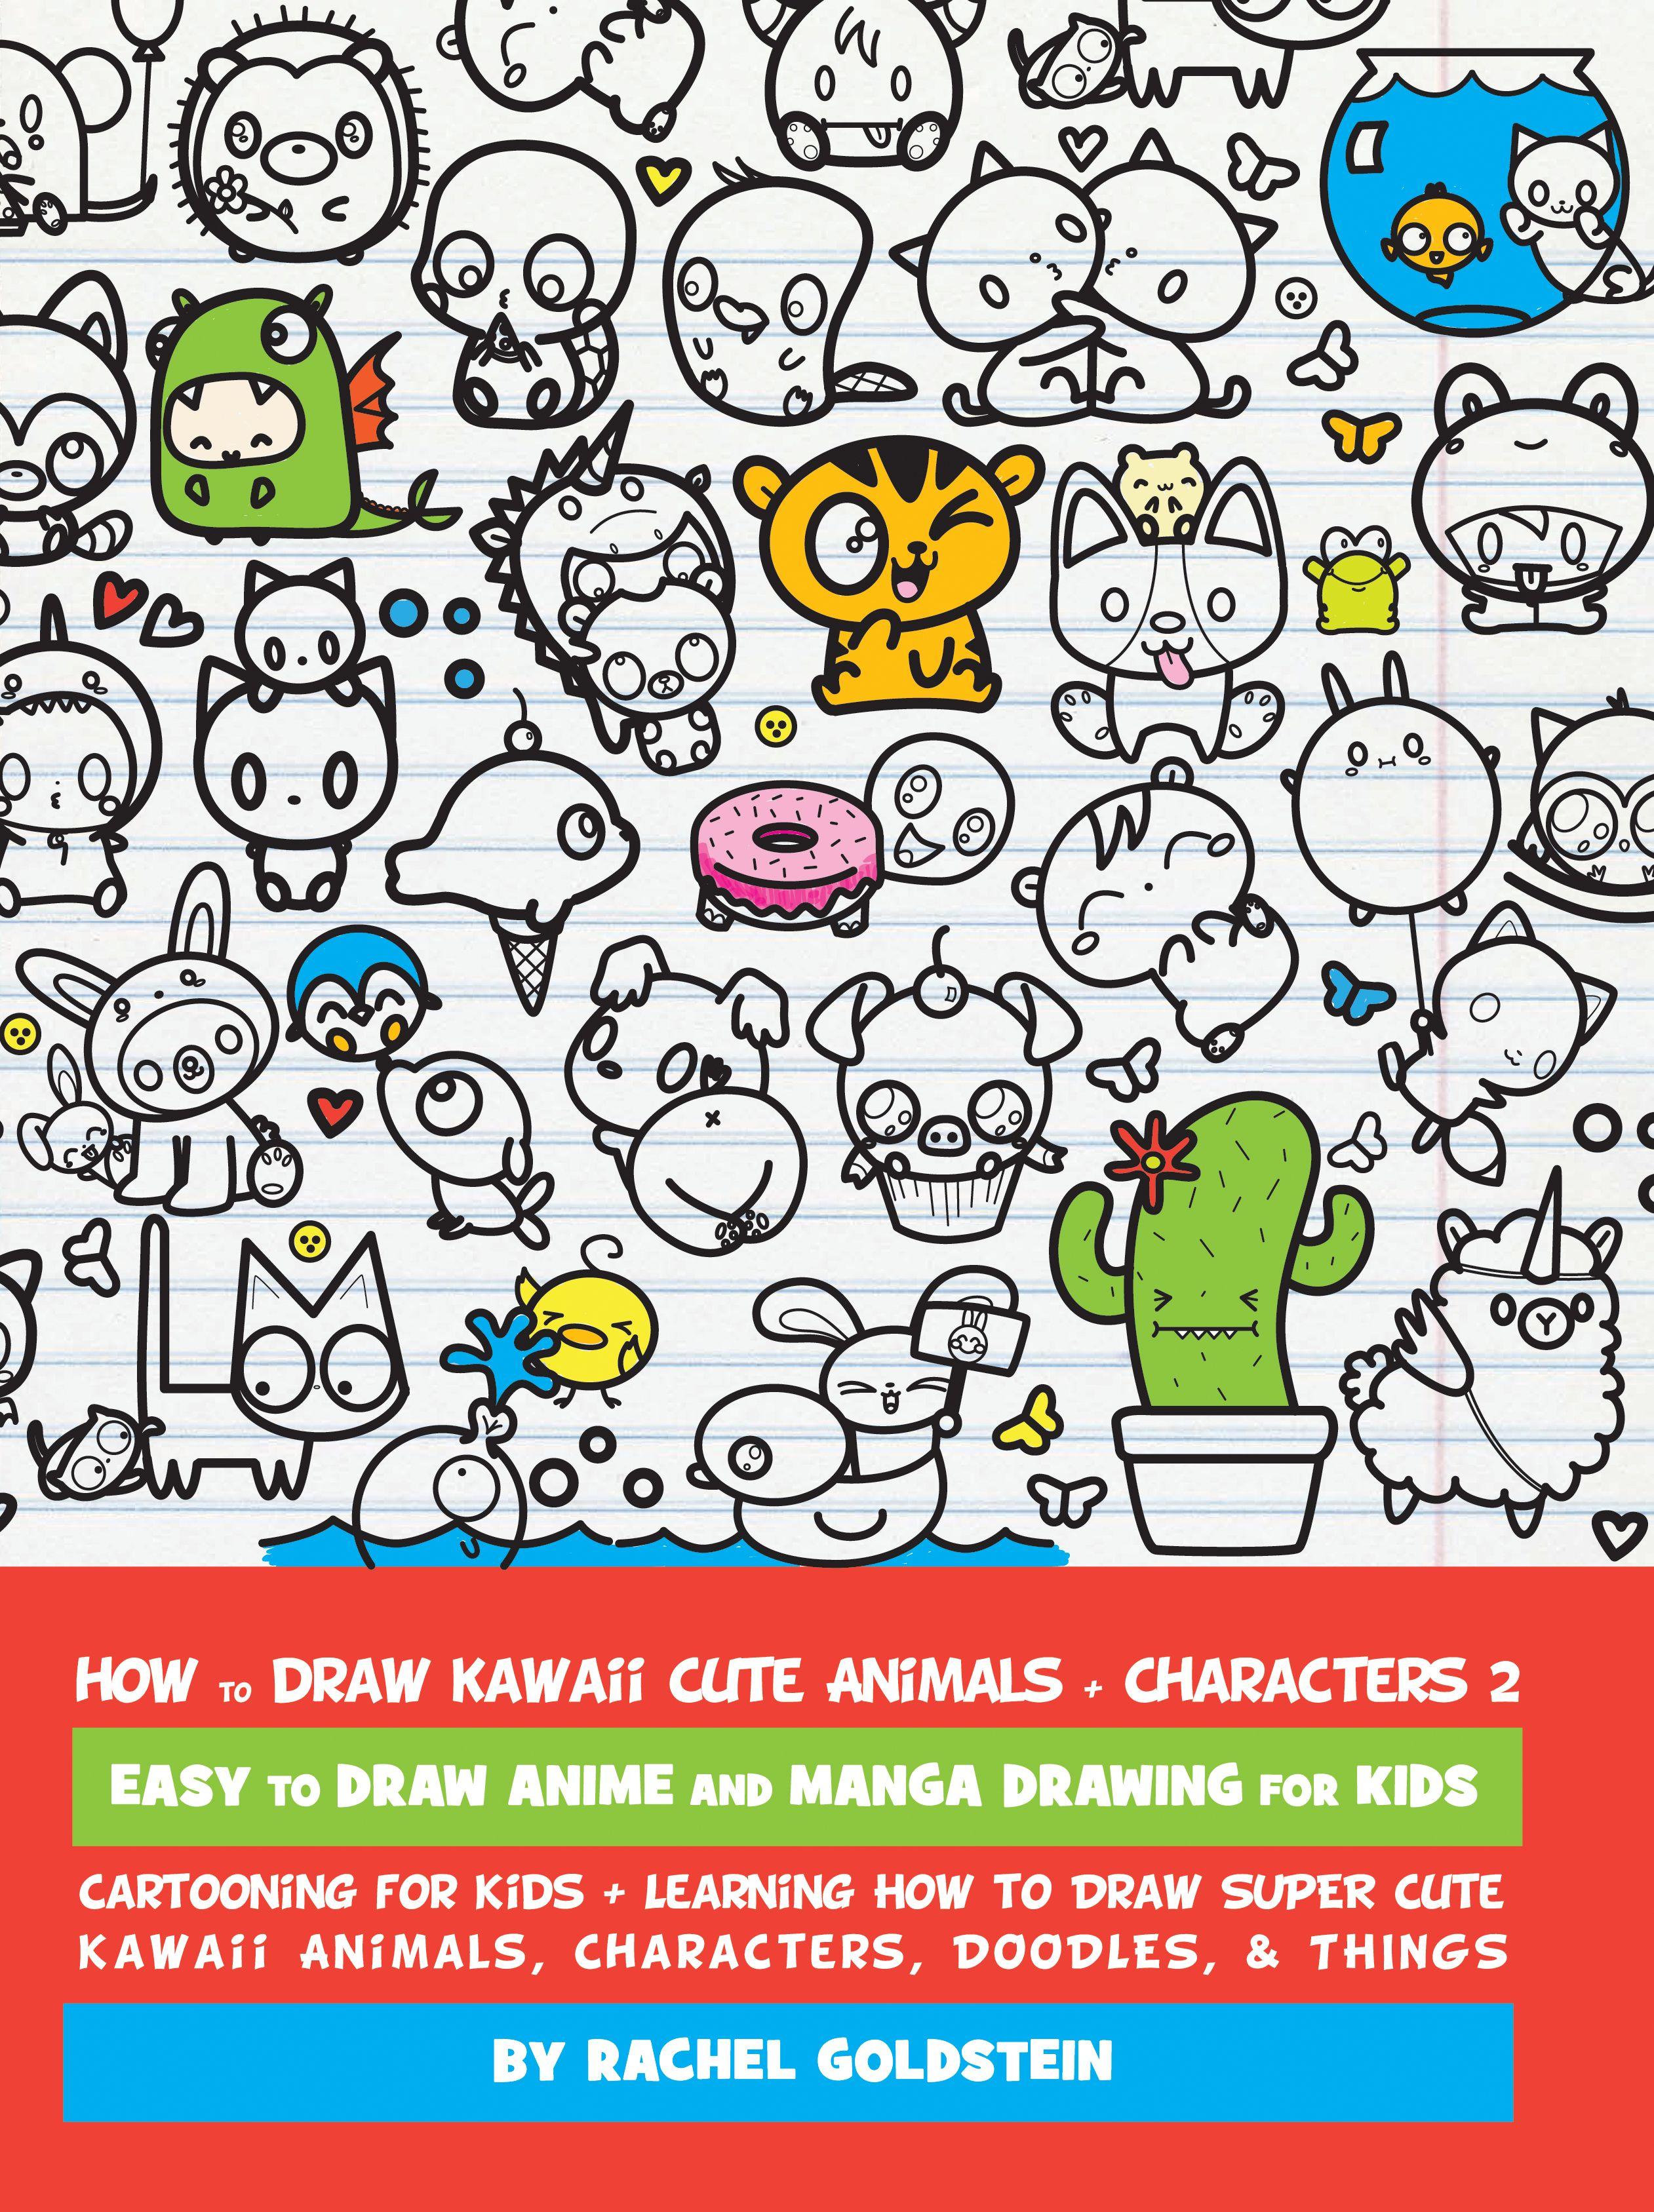 Drawing Kawaii Cute Animals, Characters, & Things 2 in